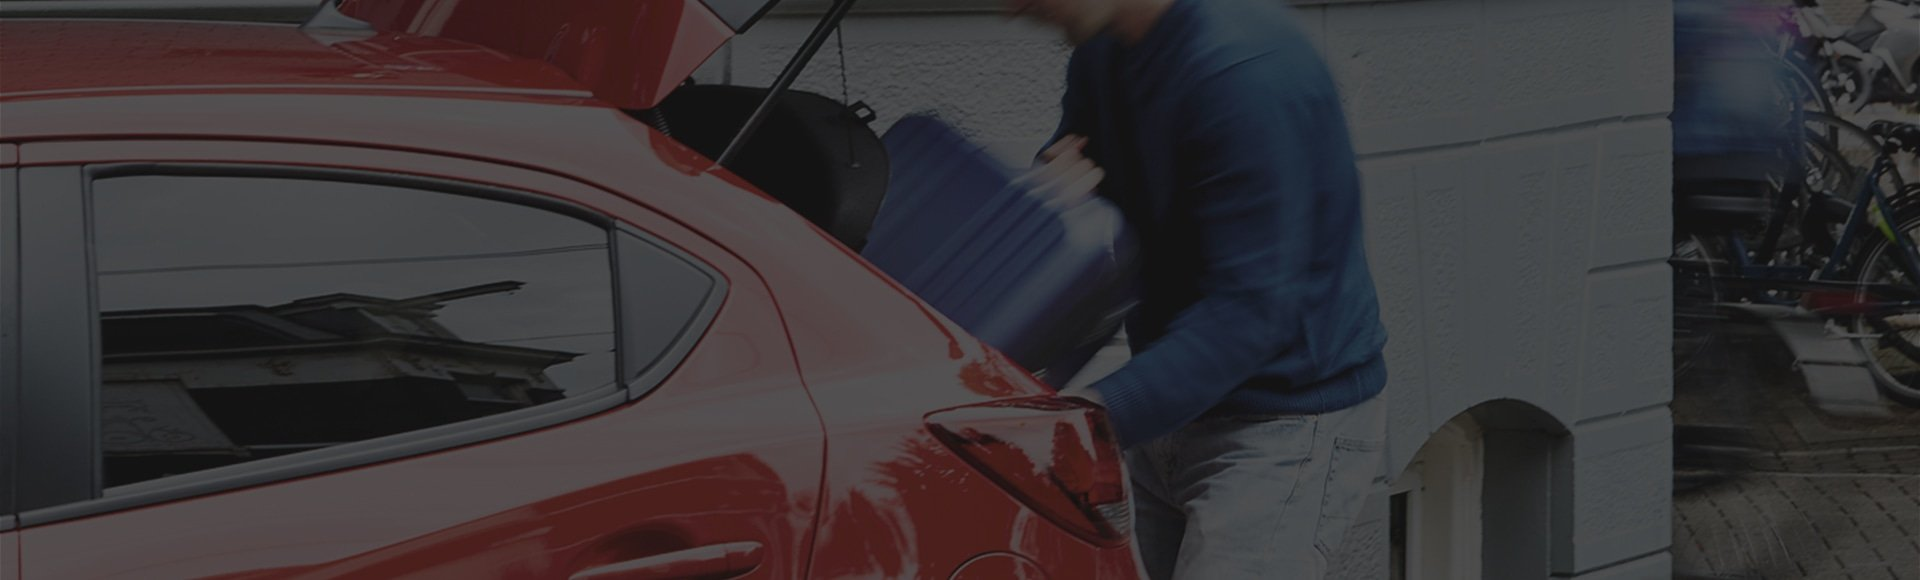 Help Support Mazda Australia 2 2008 Fuse Box